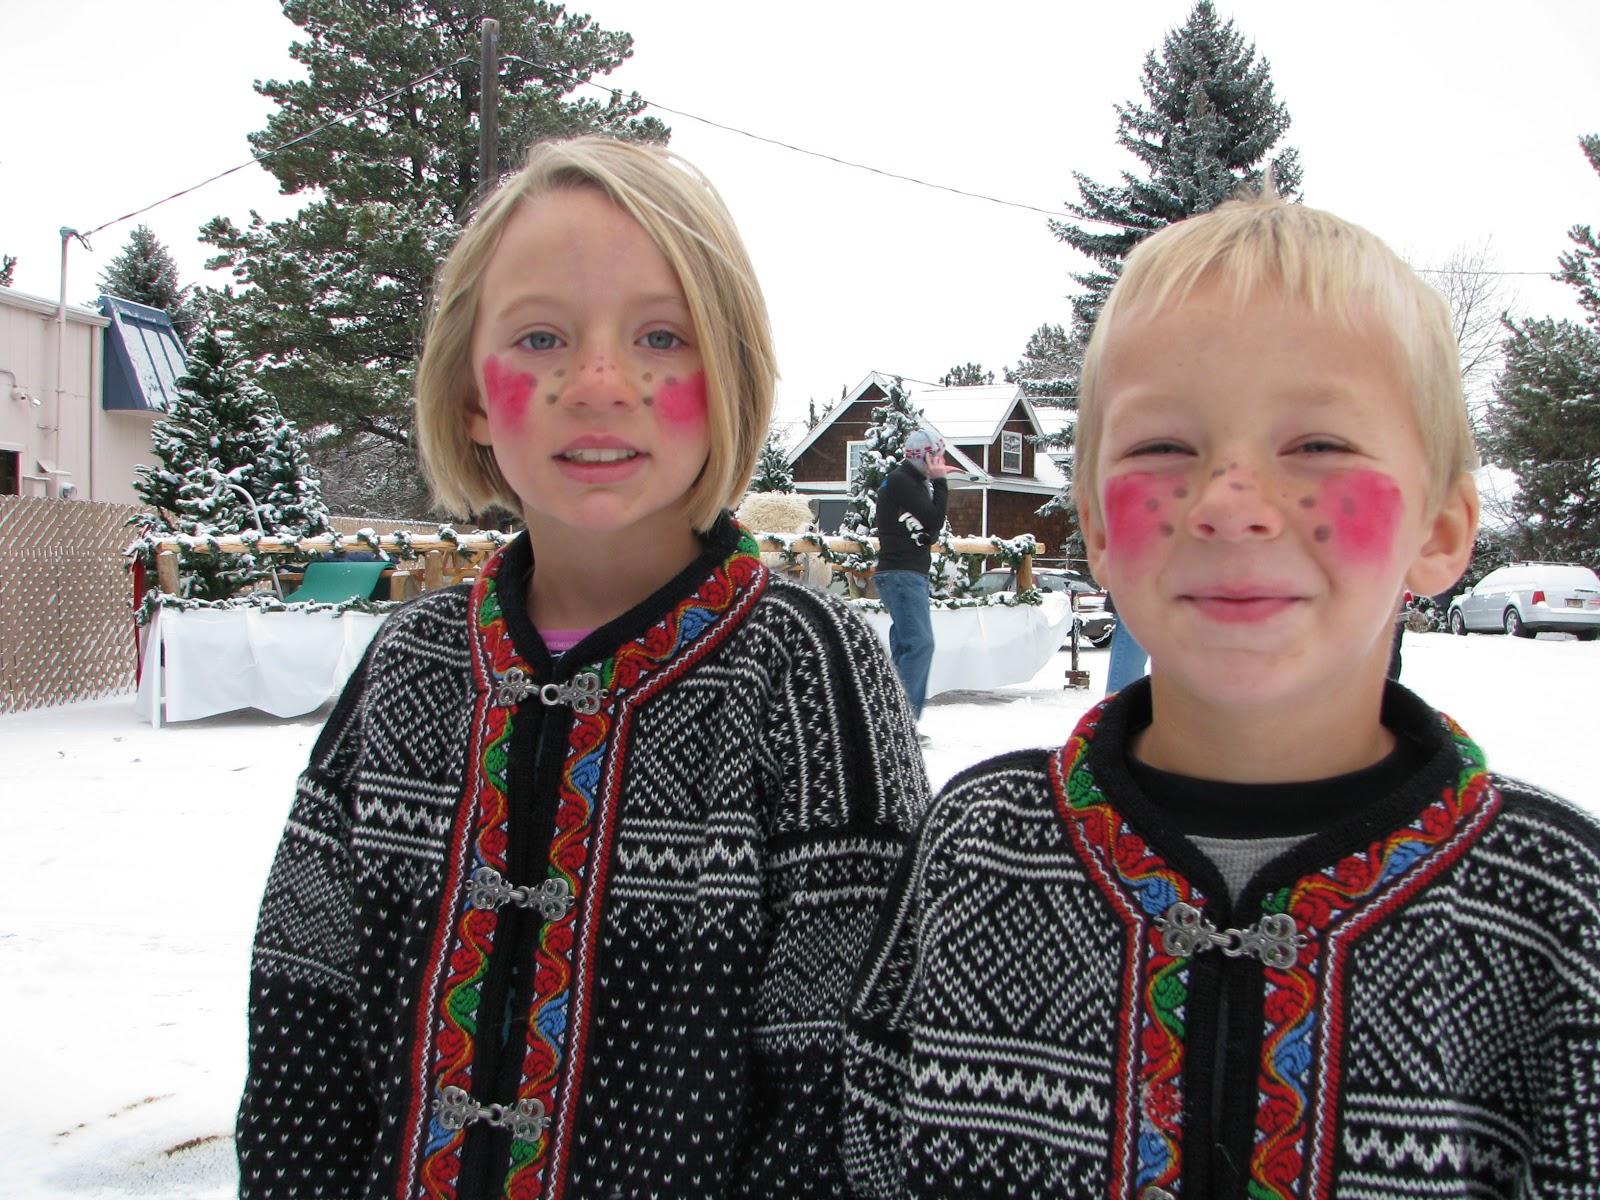 Our Scandinavian Holiday Traditions - Eva Varga